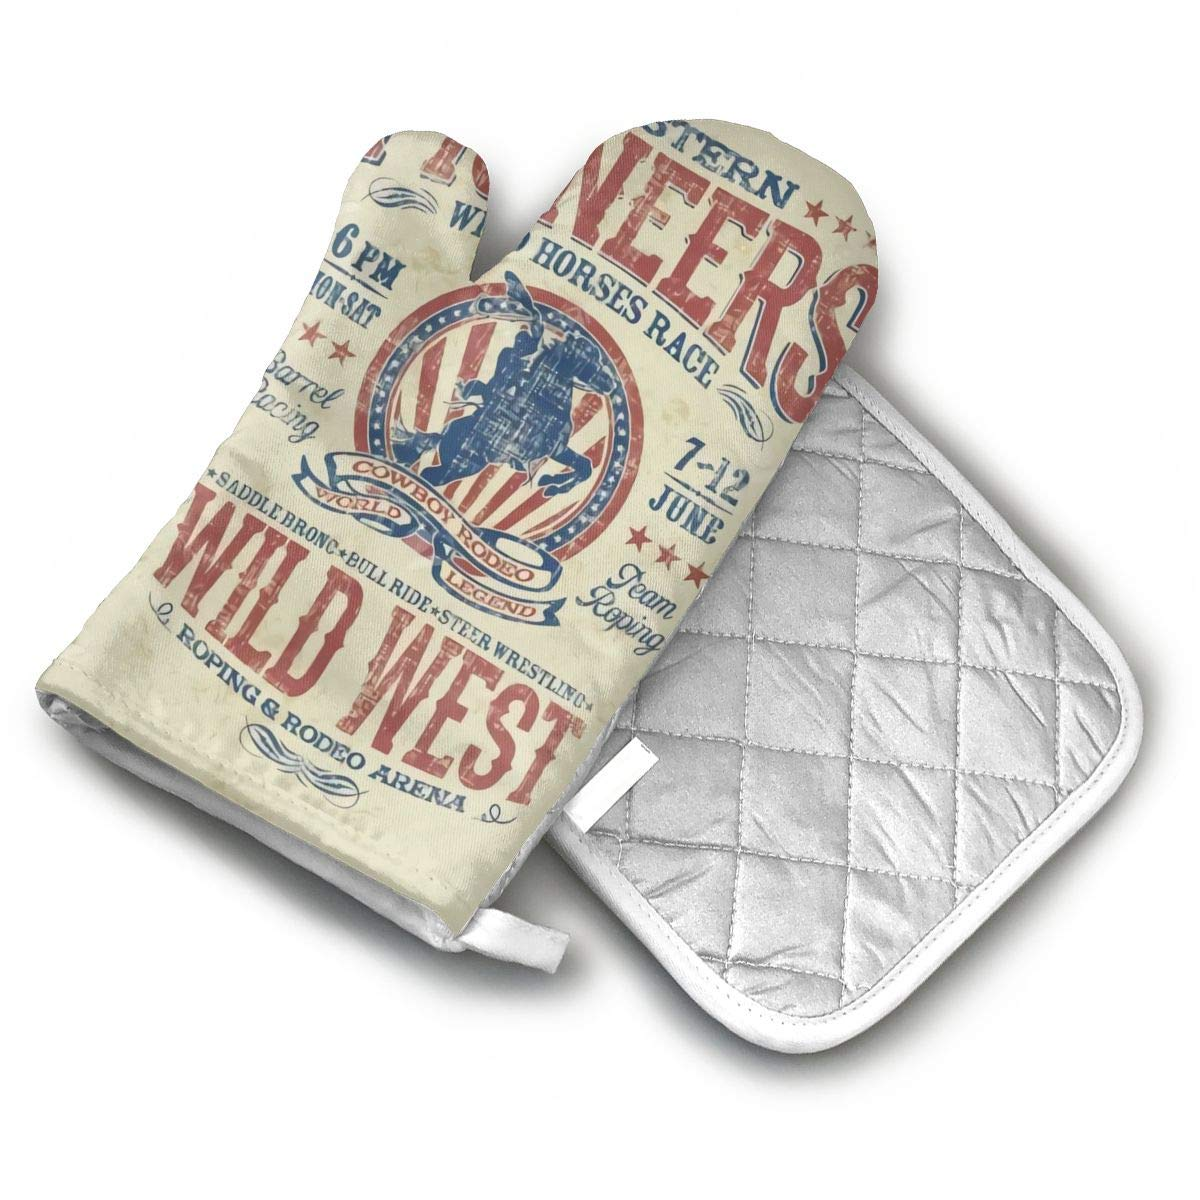 AISDHAJKSD Western Pioneers Rodeo Premium Terylene/Nylon Oven Mitts and Pot Mat,Pot Mat/Hot Pads, Heat Resistant Gloves BBQ Kitchen